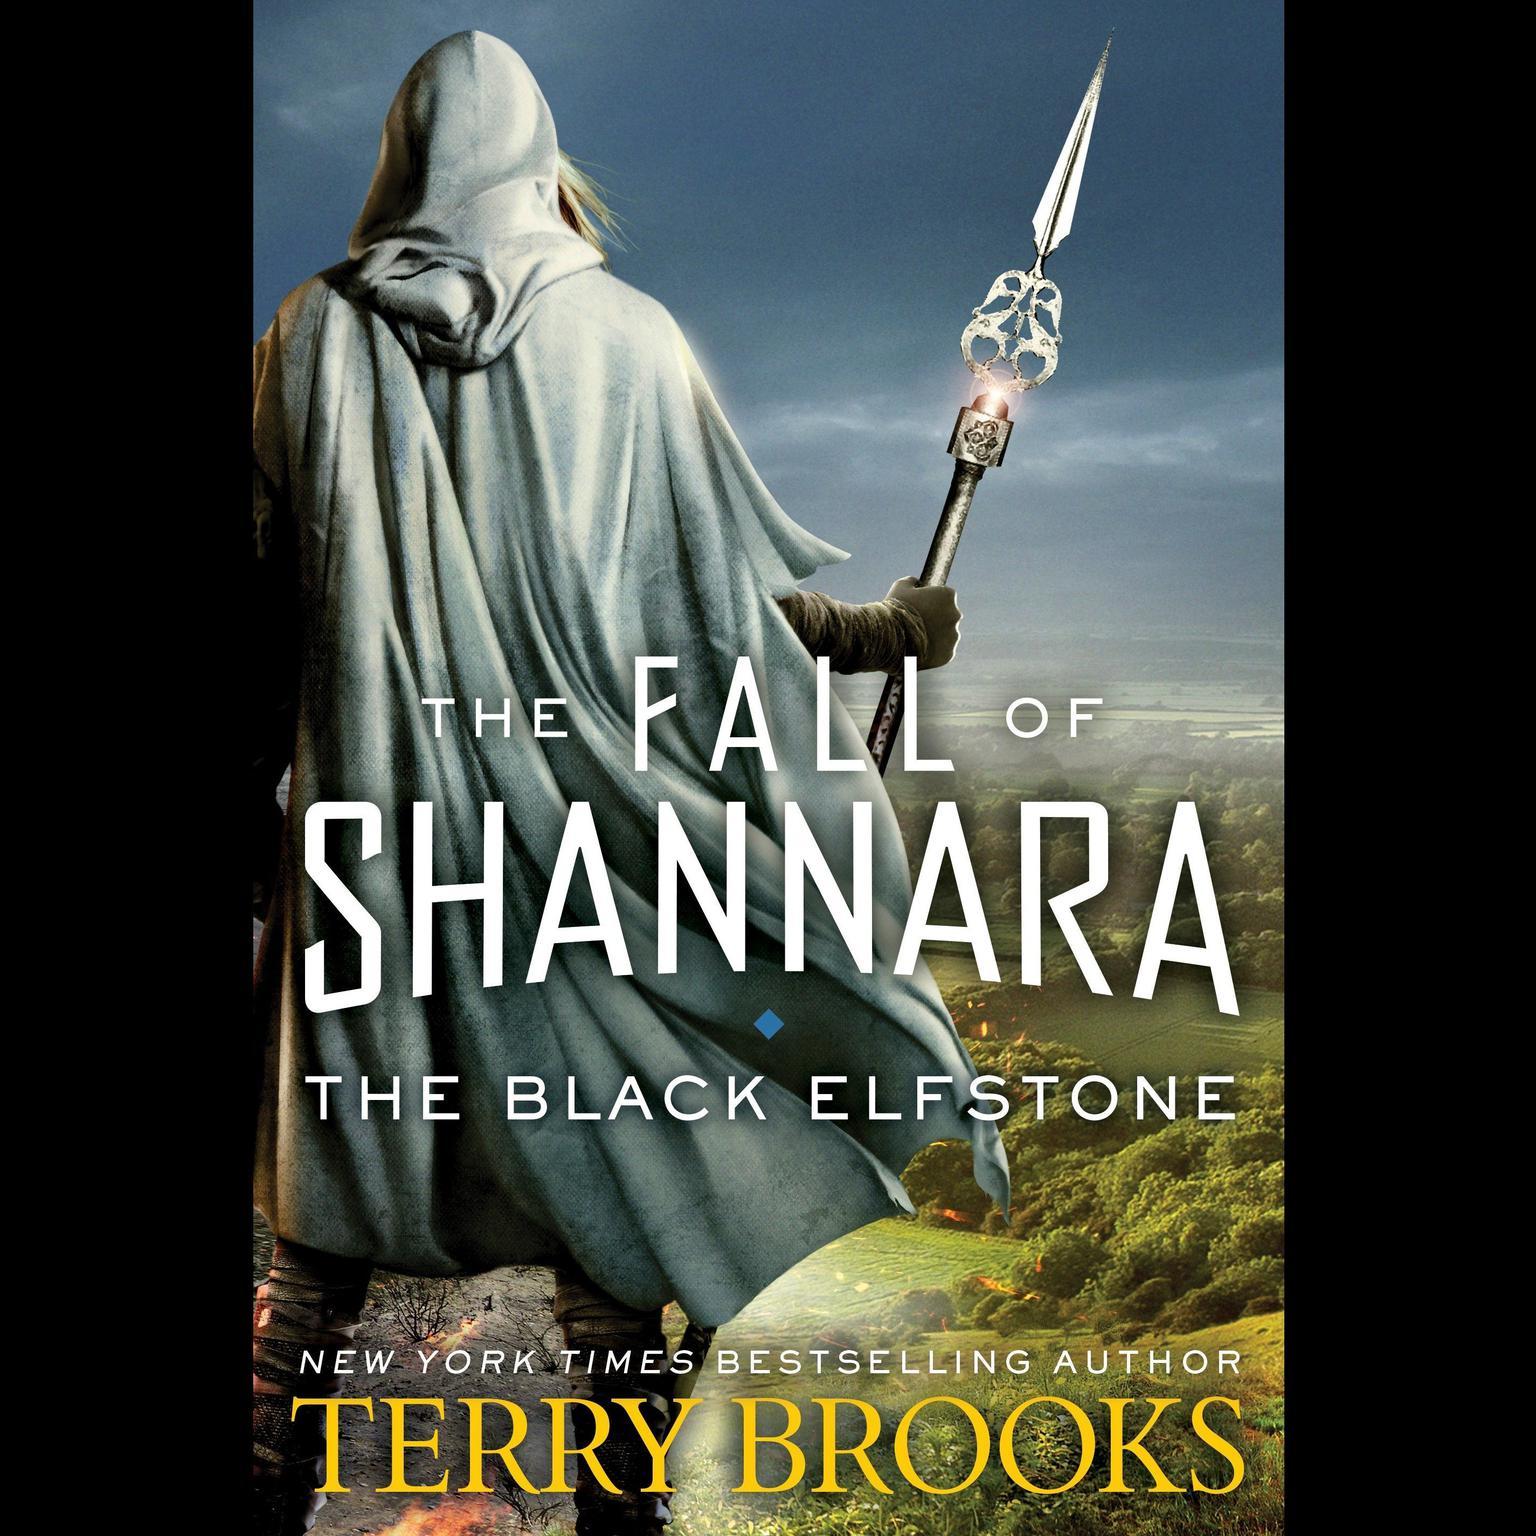 Printable The Black Elfstone: The Fall of Shannara Audiobook Cover Art